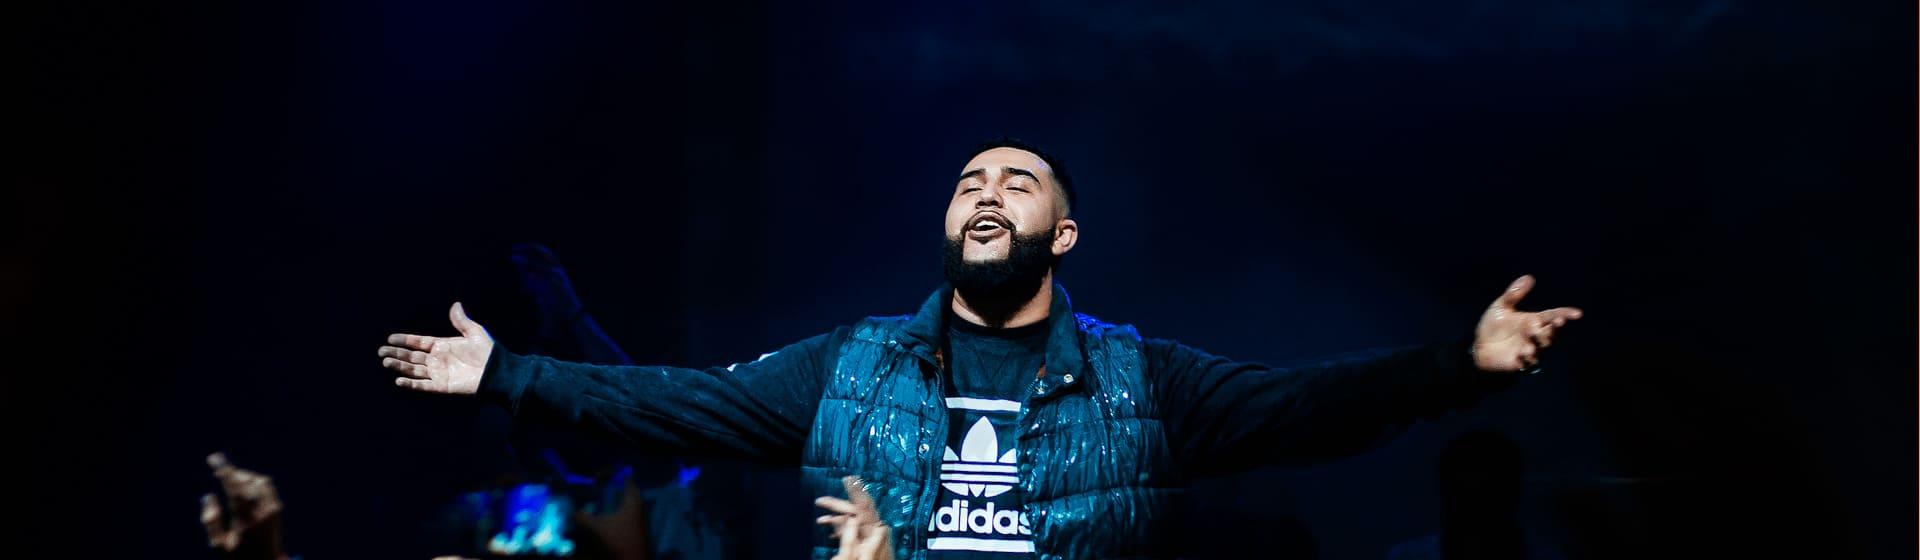 Jah Khalib - Мерч и одежда с атрибутикой